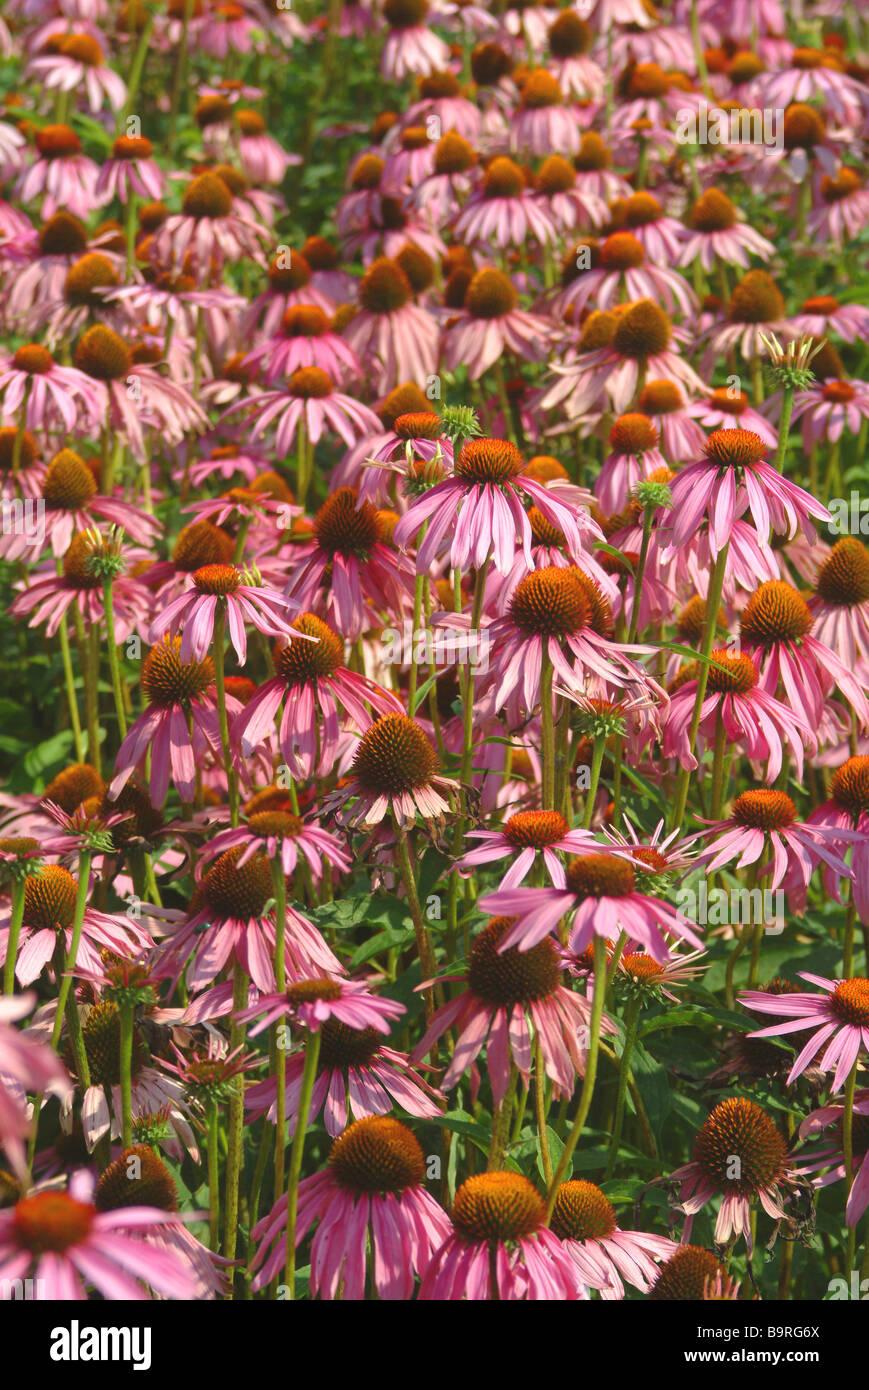 Medicinal plant Roter Sonnenhut Rudbeckia purple conflower Echinacea purpurea - Stock Image